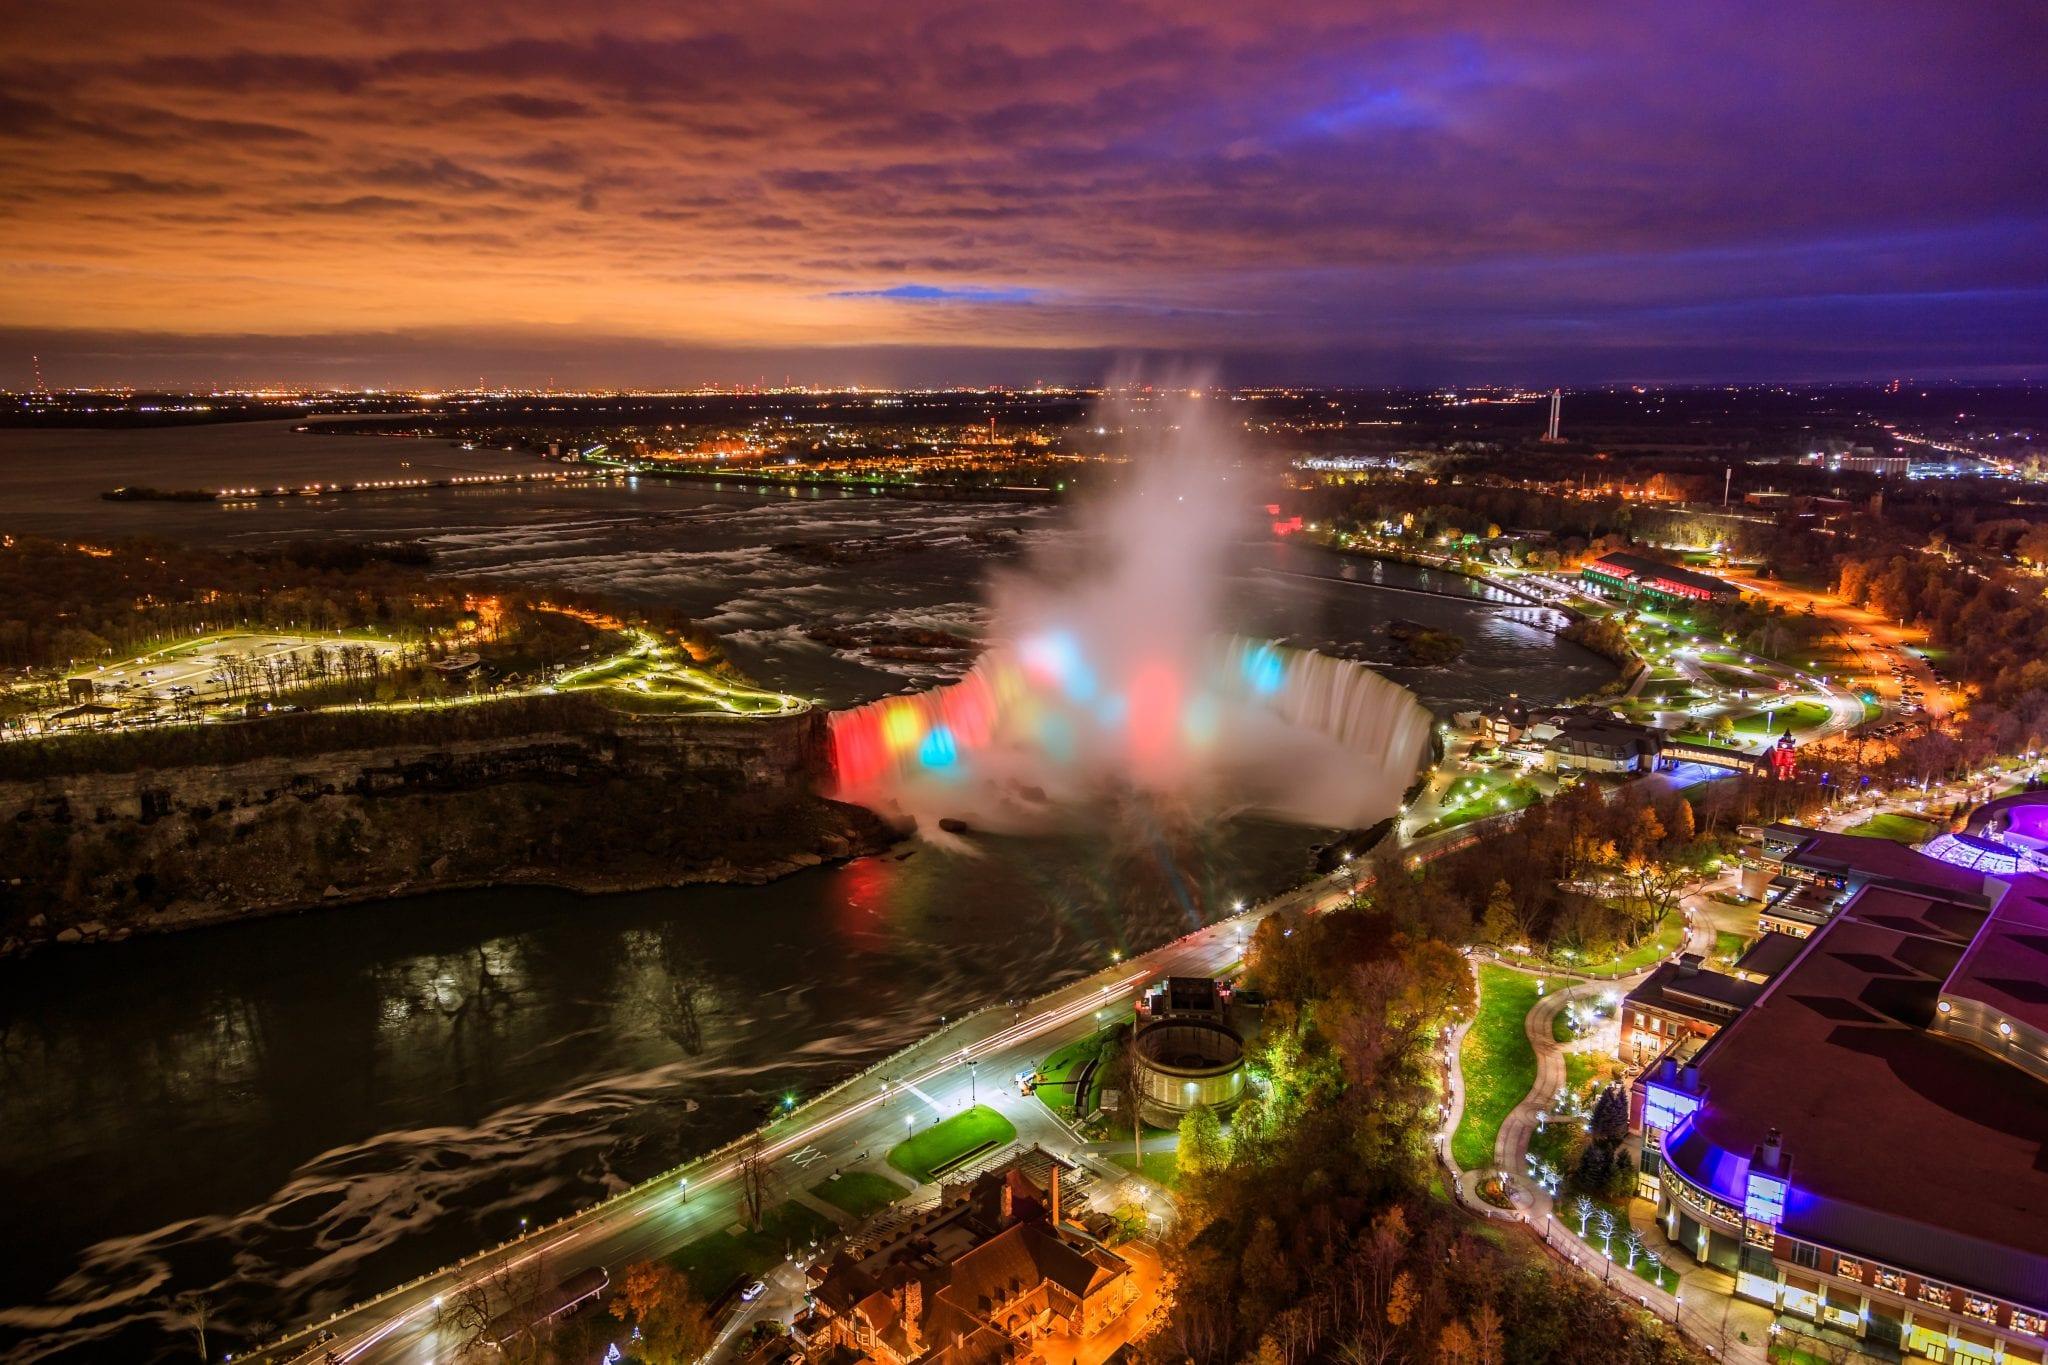 Wanderlust | Good Life of a Housewife Niagara Falls | Maid of the mist Boat Tour Niagara Falls | Bird View of Niagara Falls Canada and America during sunset